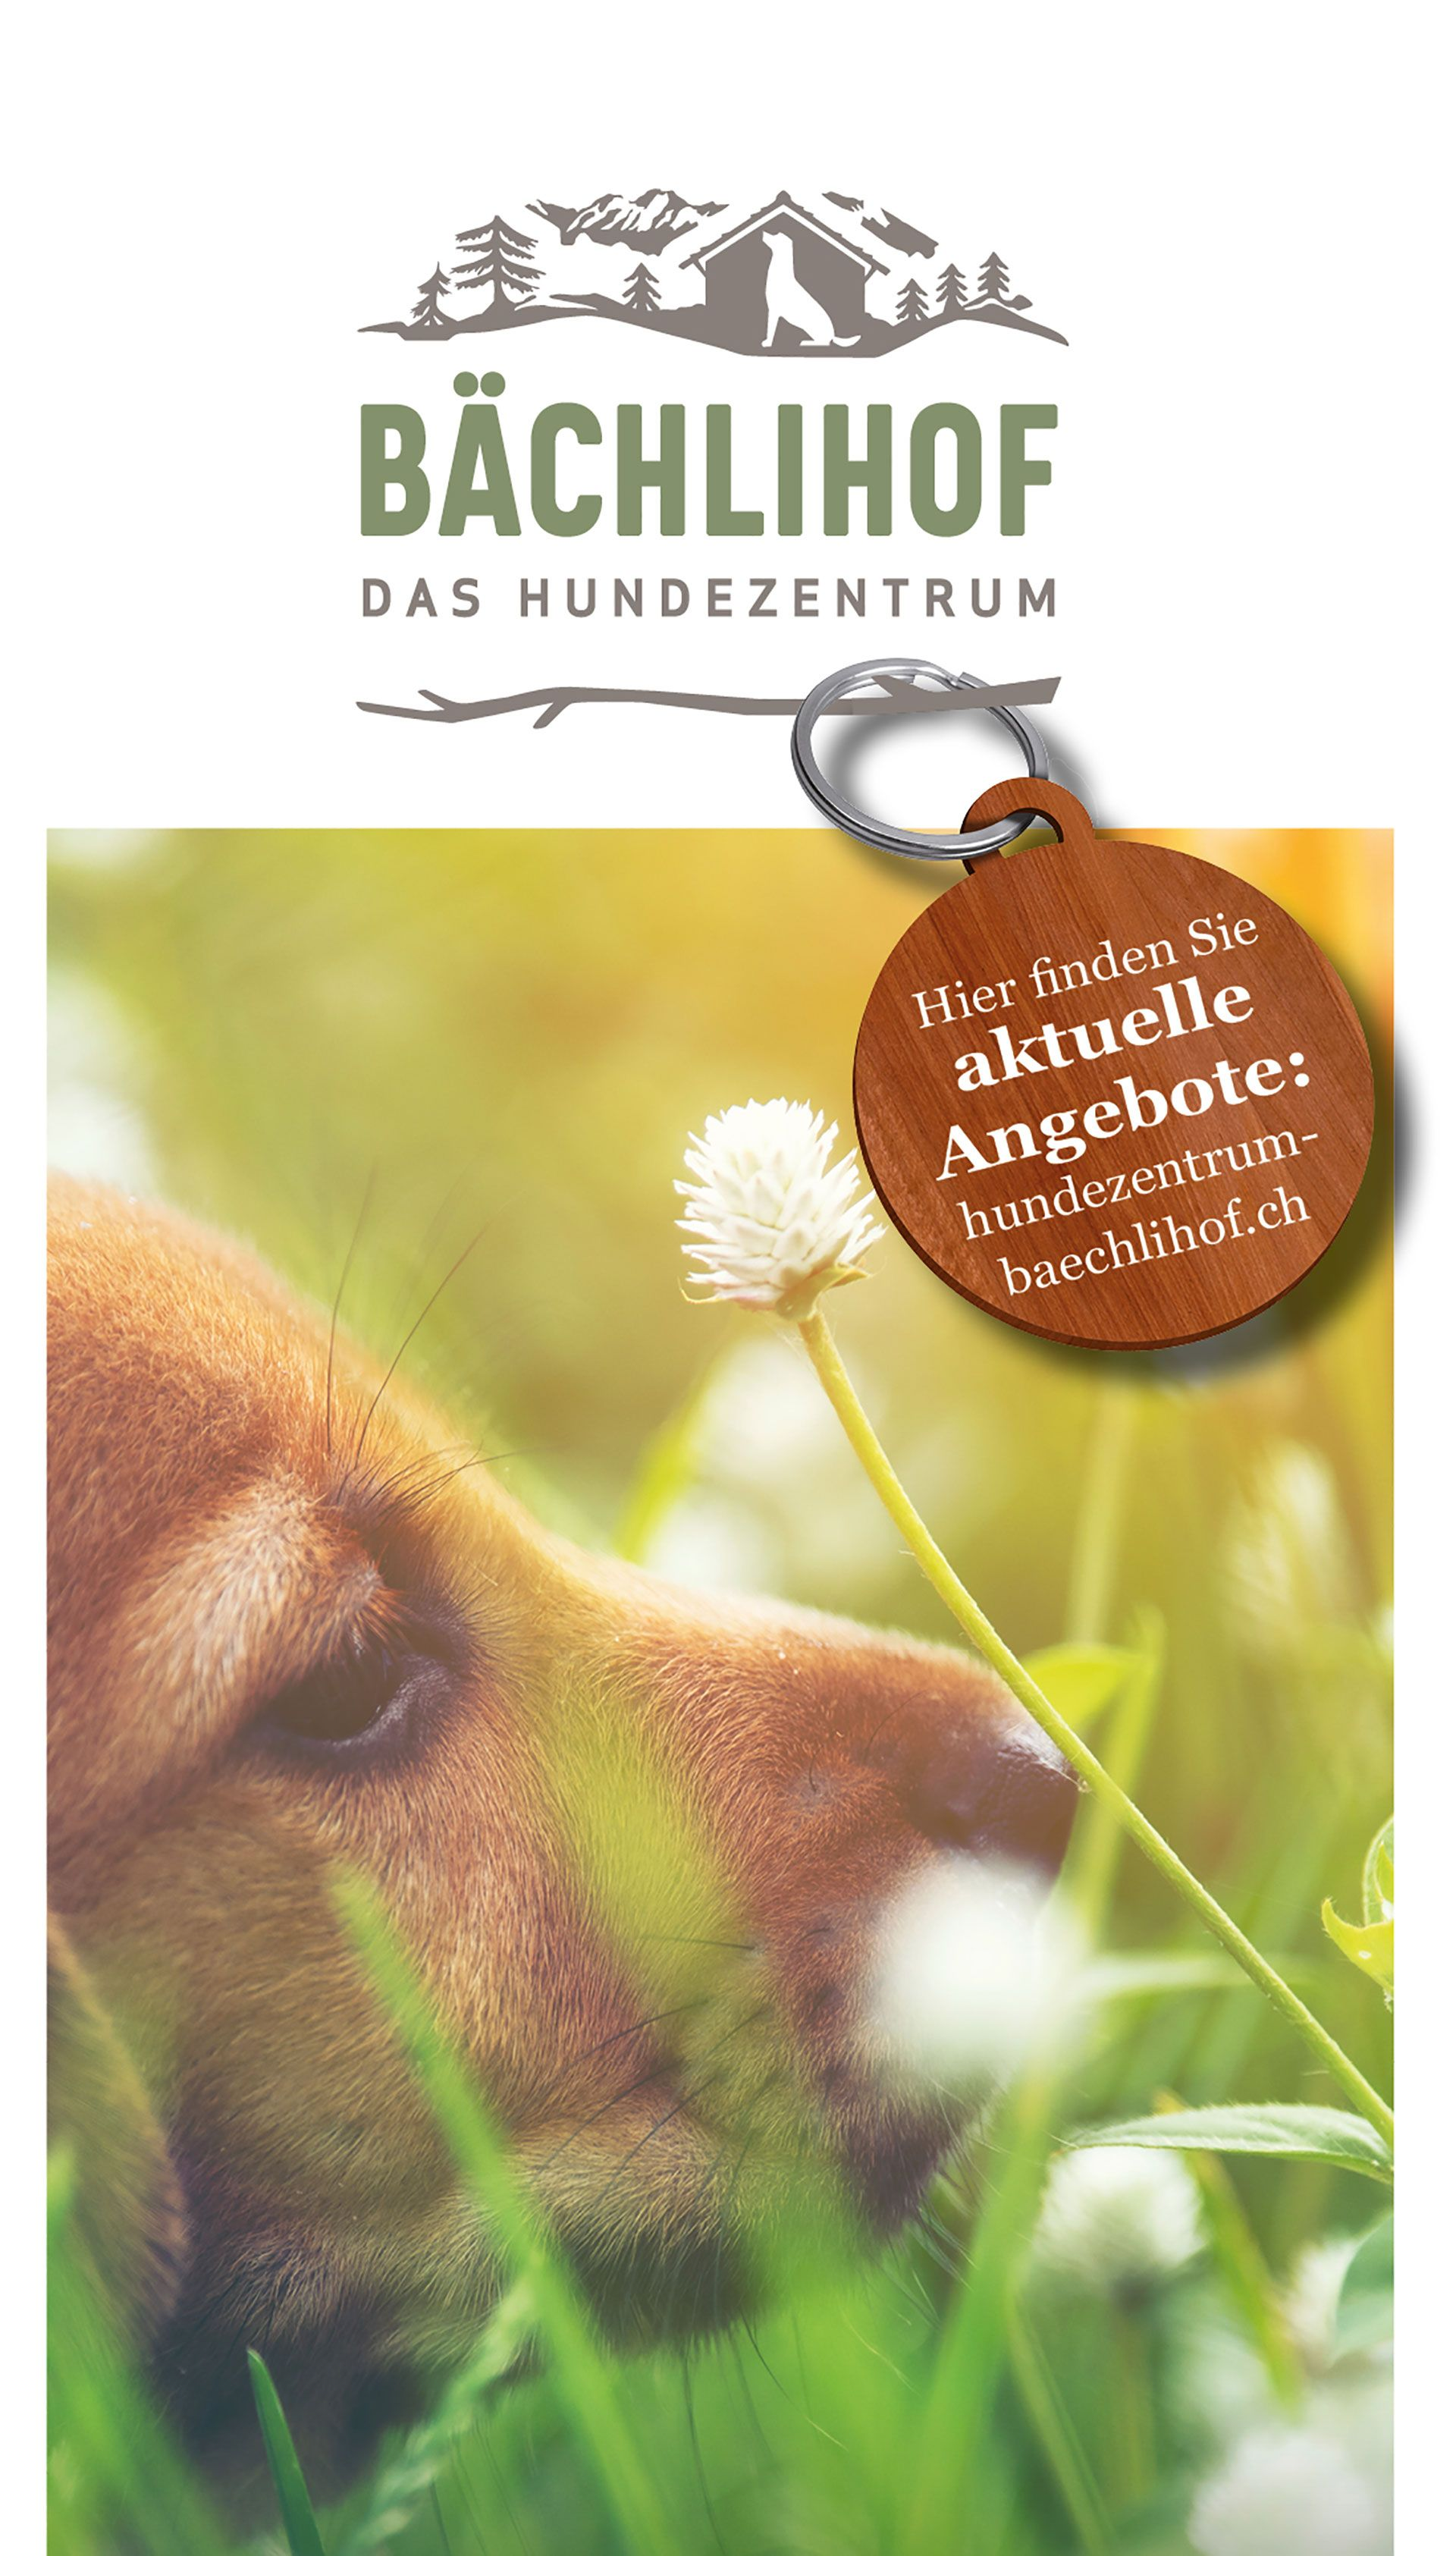 Baechlihof_Hundezentrum_Preisliste2021.jpg